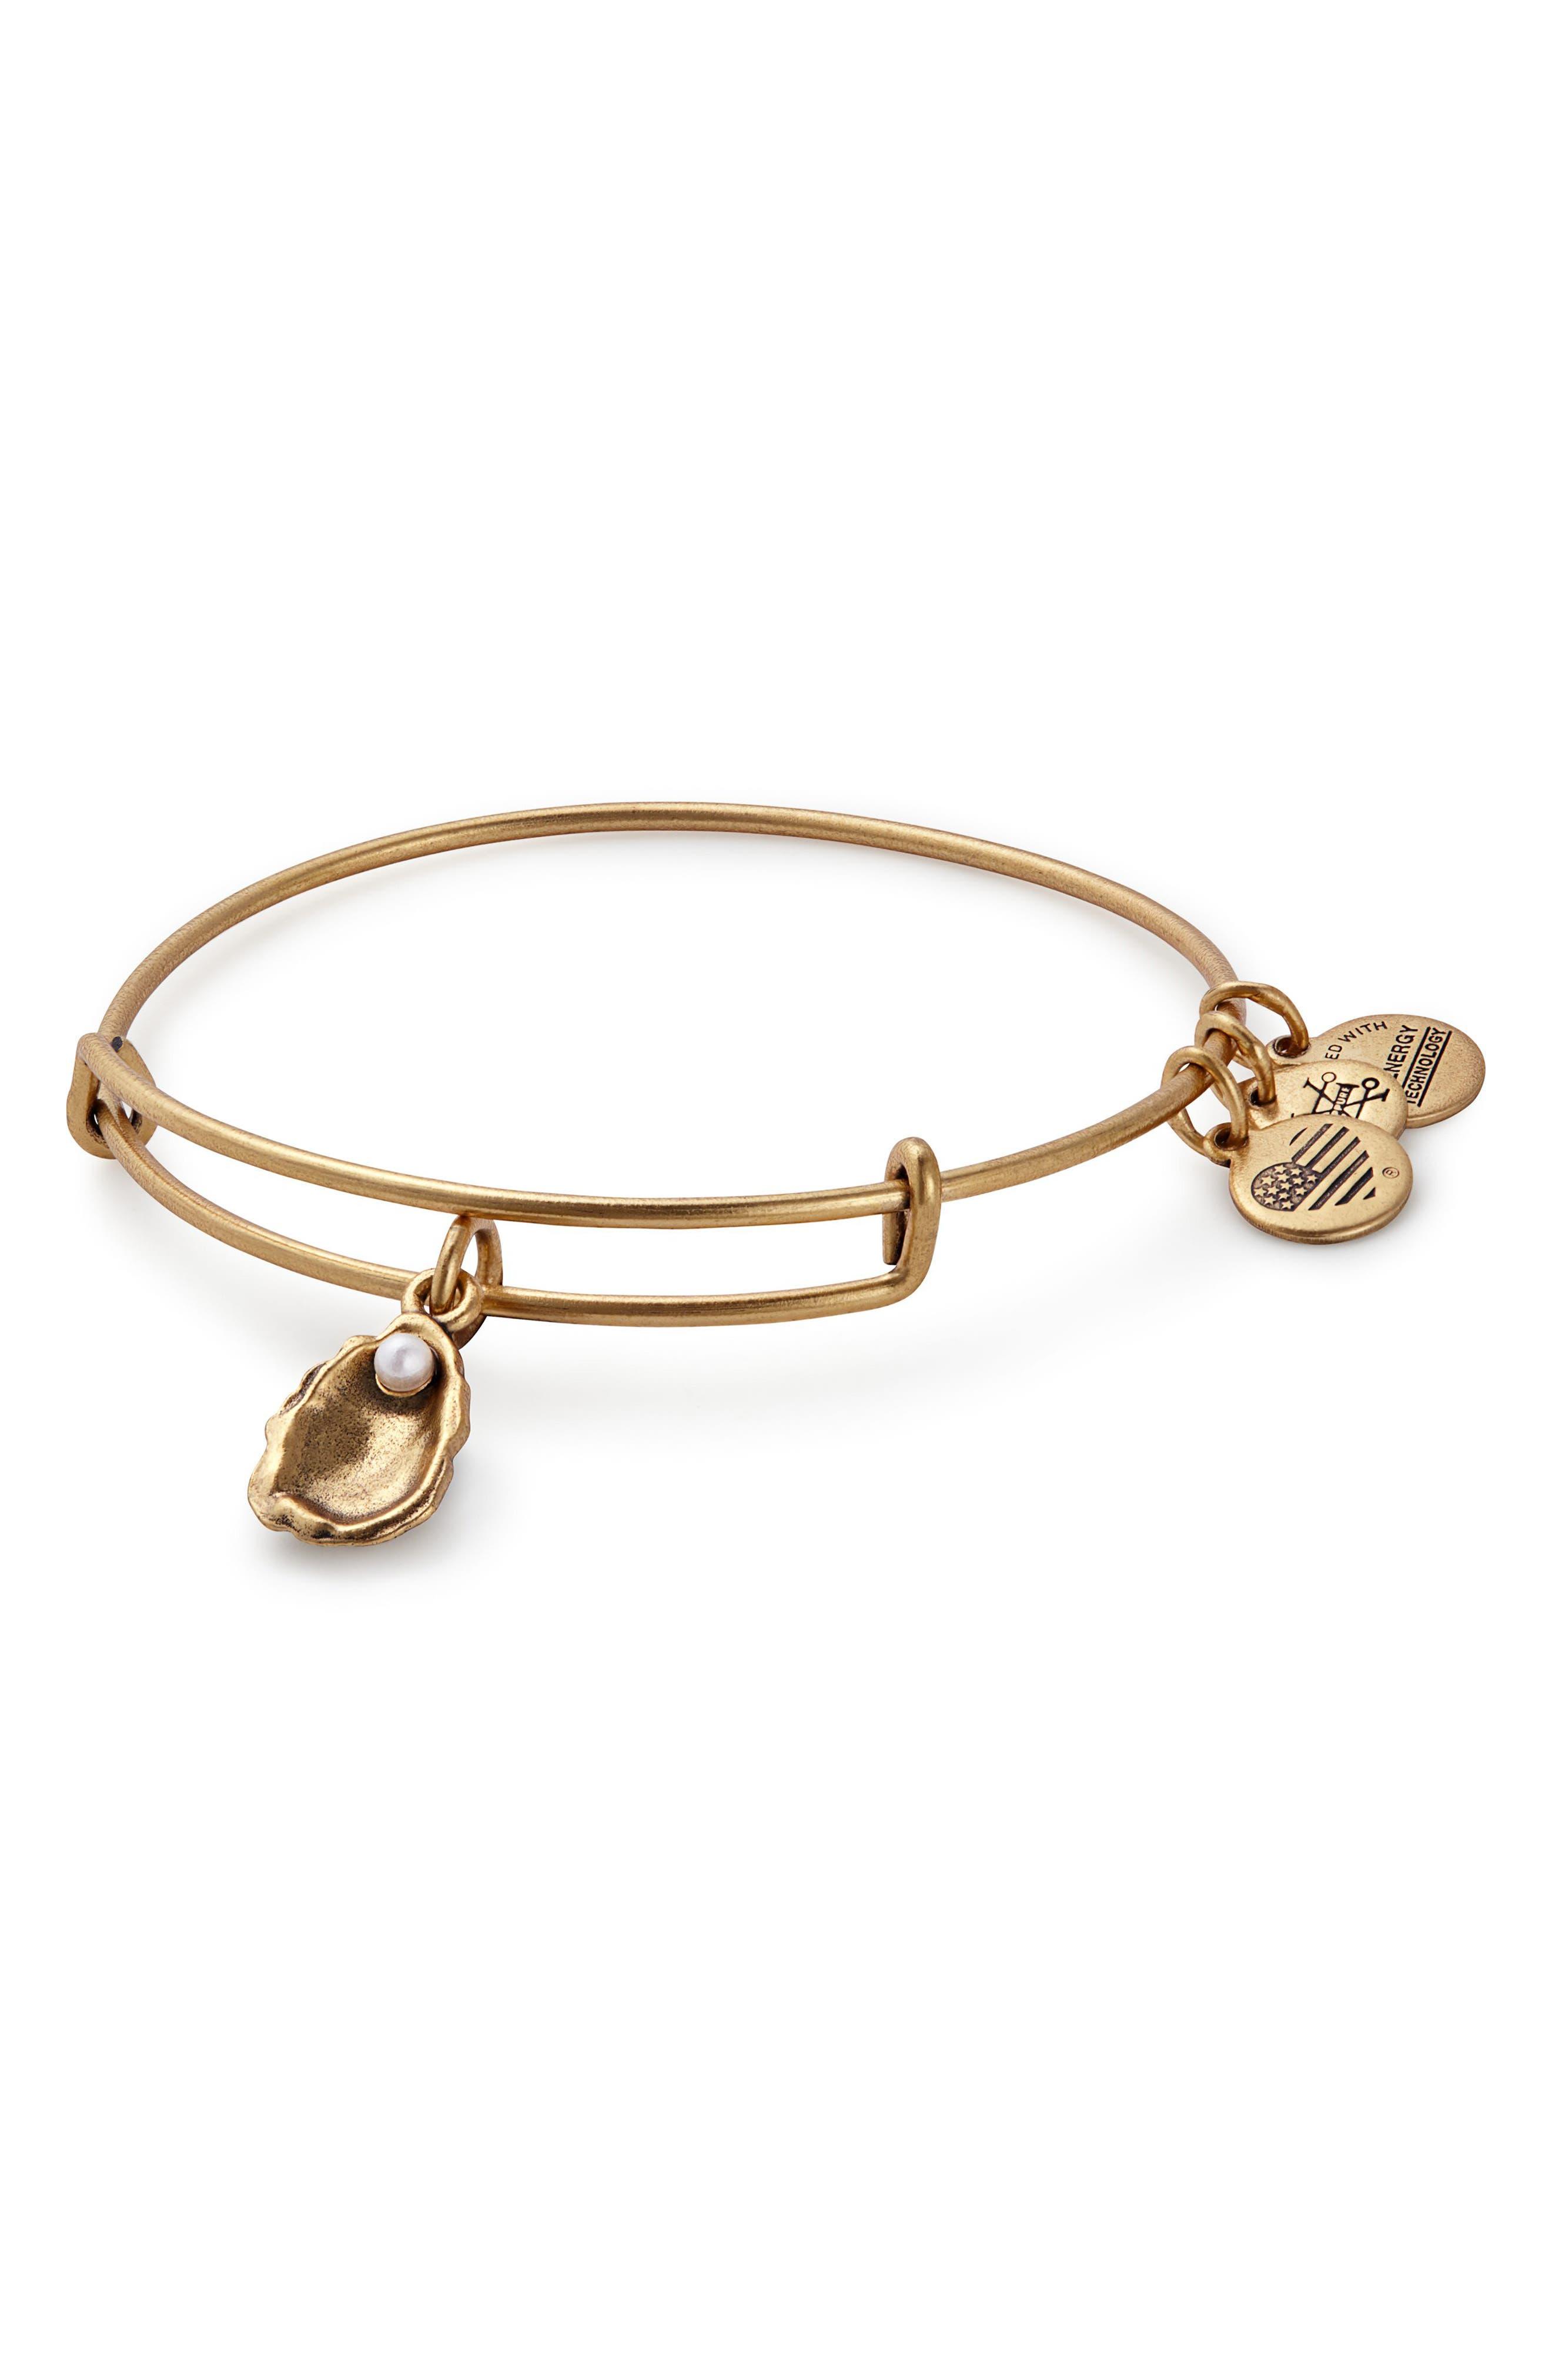 Imitation Pearl Oyster Adjustable Bracelet,                             Main thumbnail 1, color,                             Gold